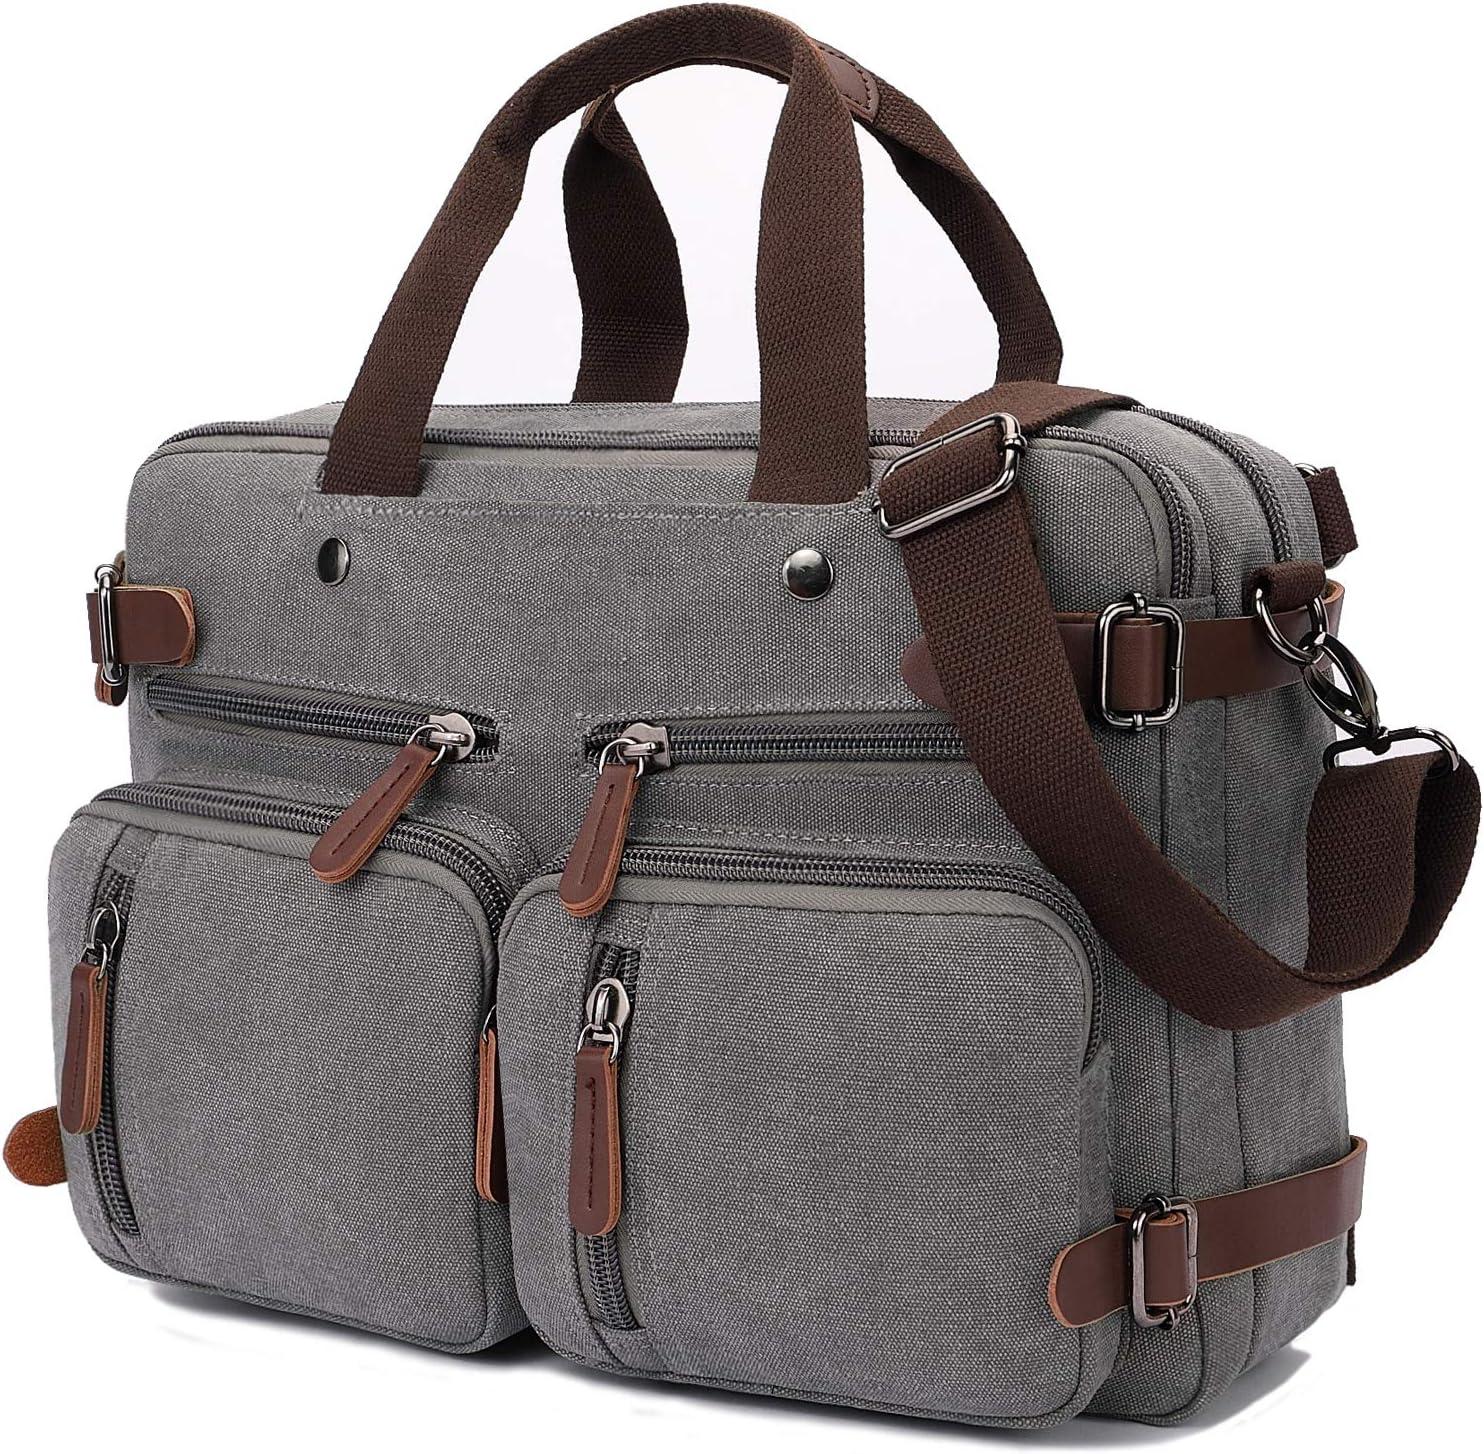 Convertible Laptop Backpack 15.6 Inch Messenger Bag for Men/Women (15.6 Inch, Grey)